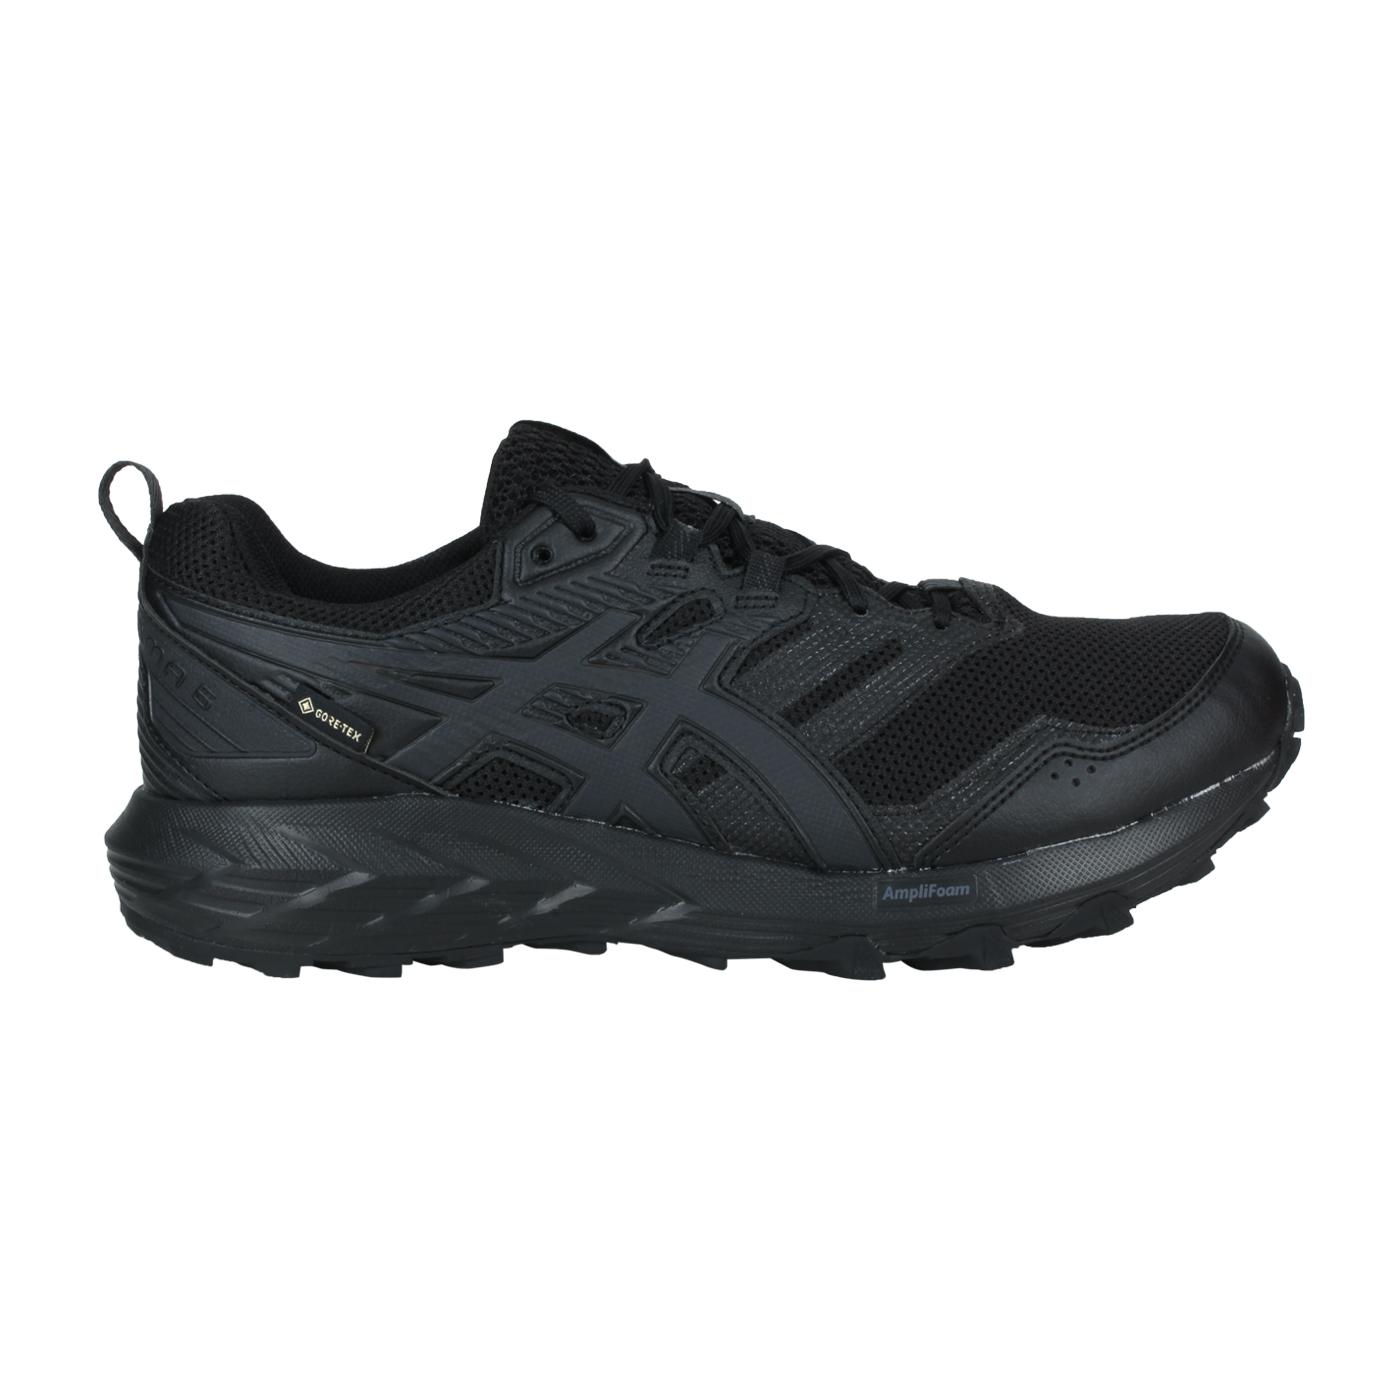 ASICS 女款慢跑鞋  @GEL-SONOMA 6 G-TX@1012A921-002